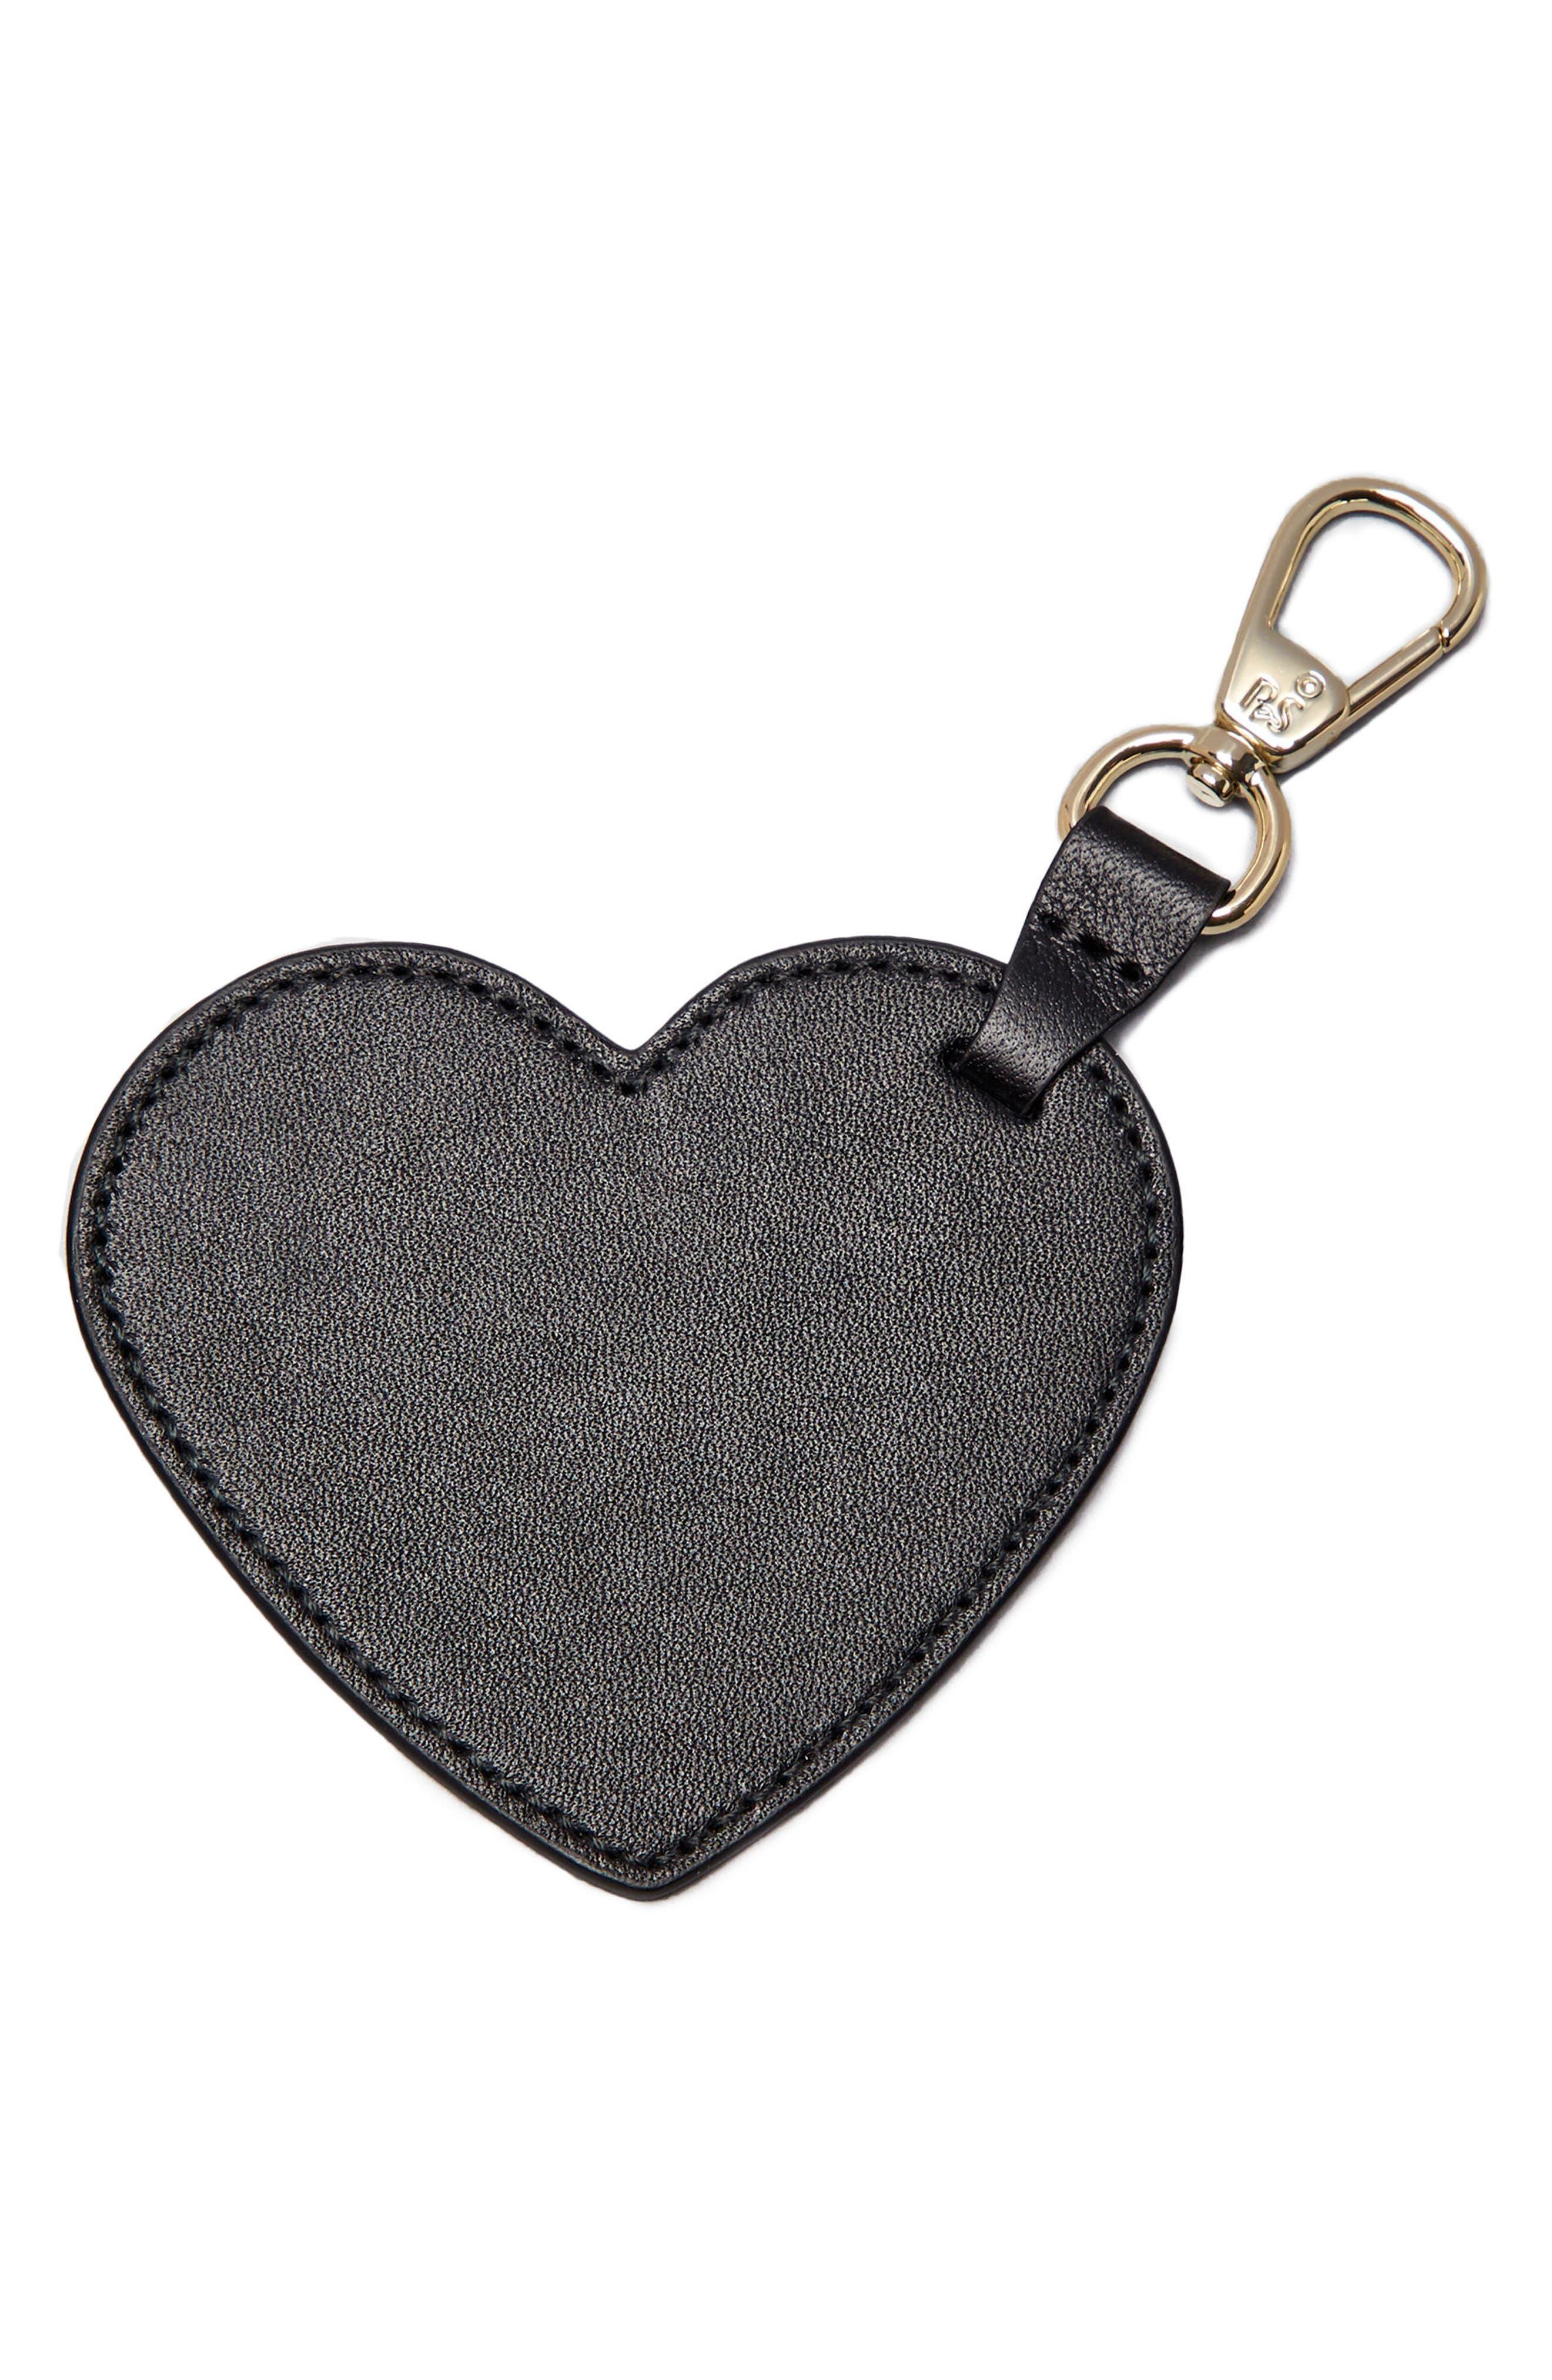 Smaller Heart Bag Charm,                         Main,                         color, 001